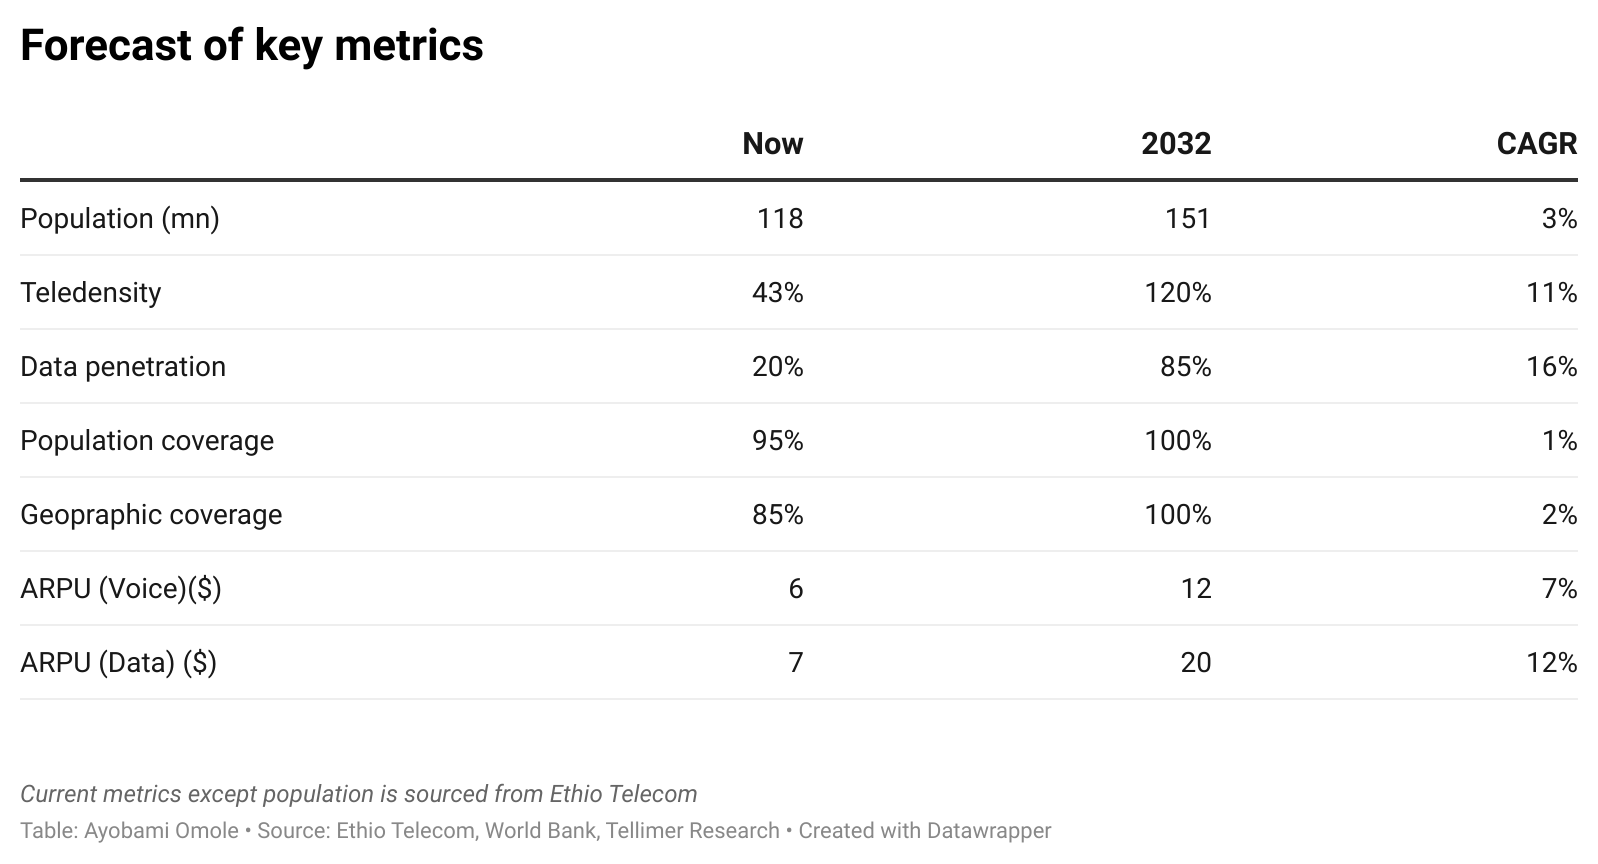 Forecast of key metrics